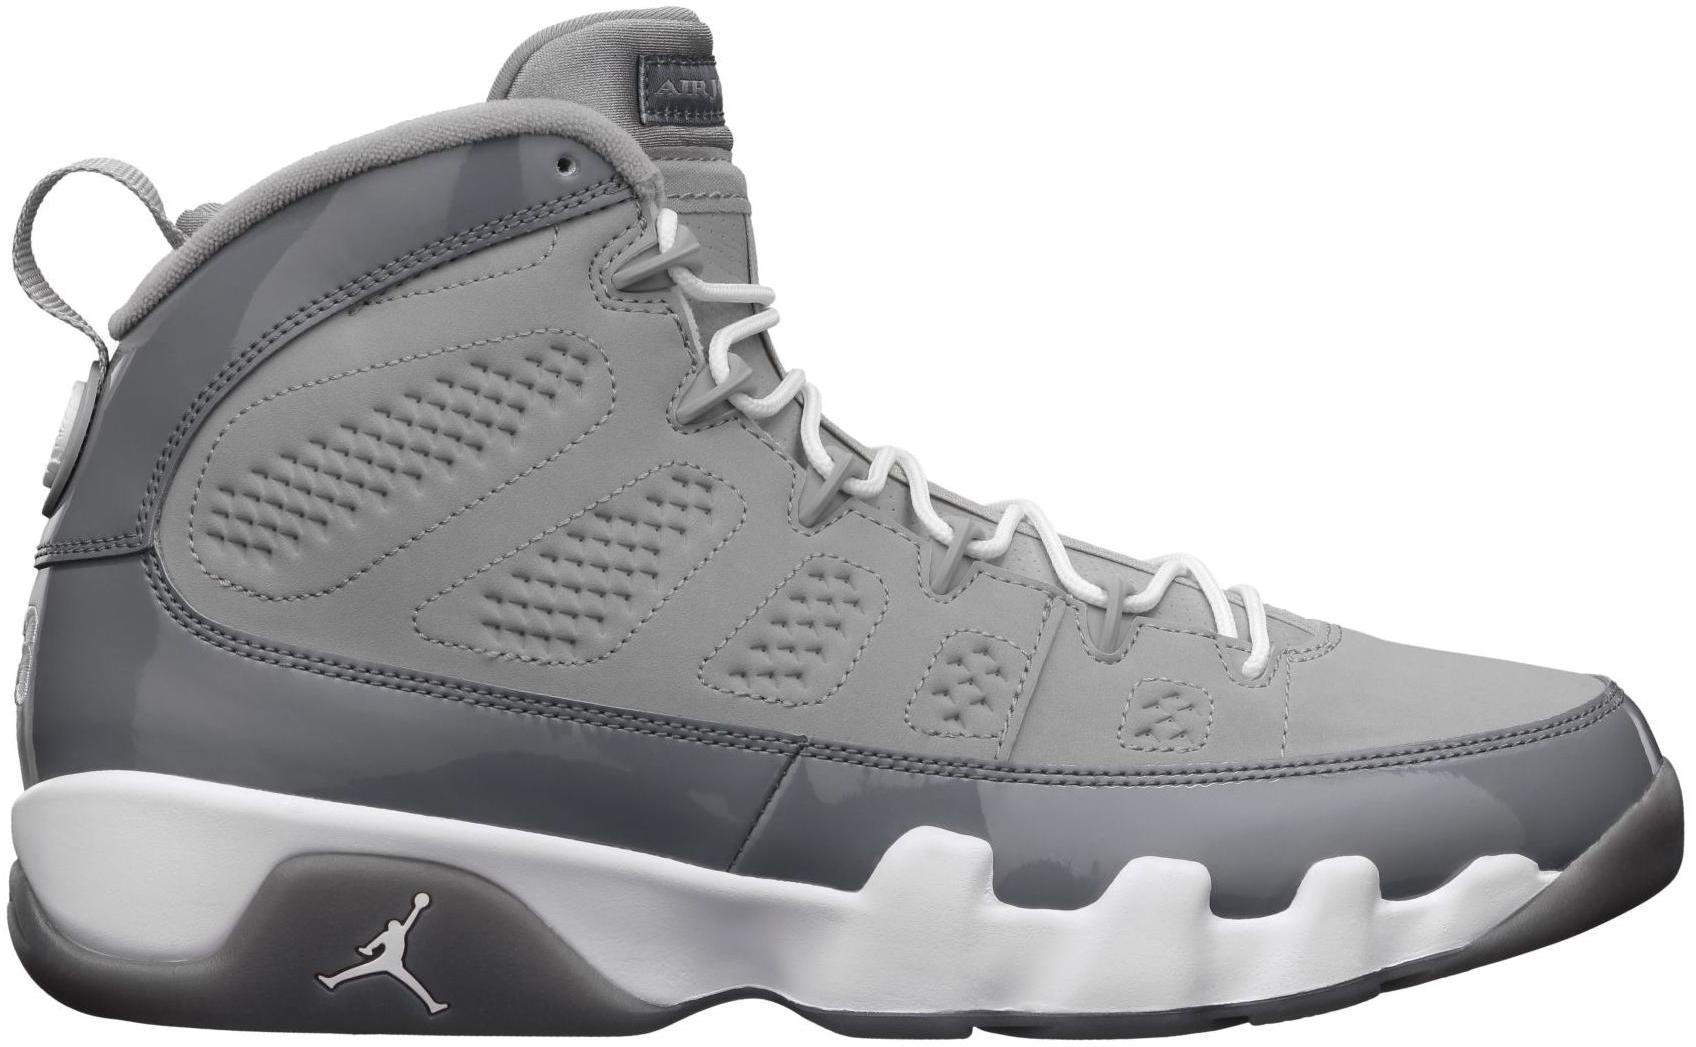 Jordan 9 Retro Cool Grey (2012)